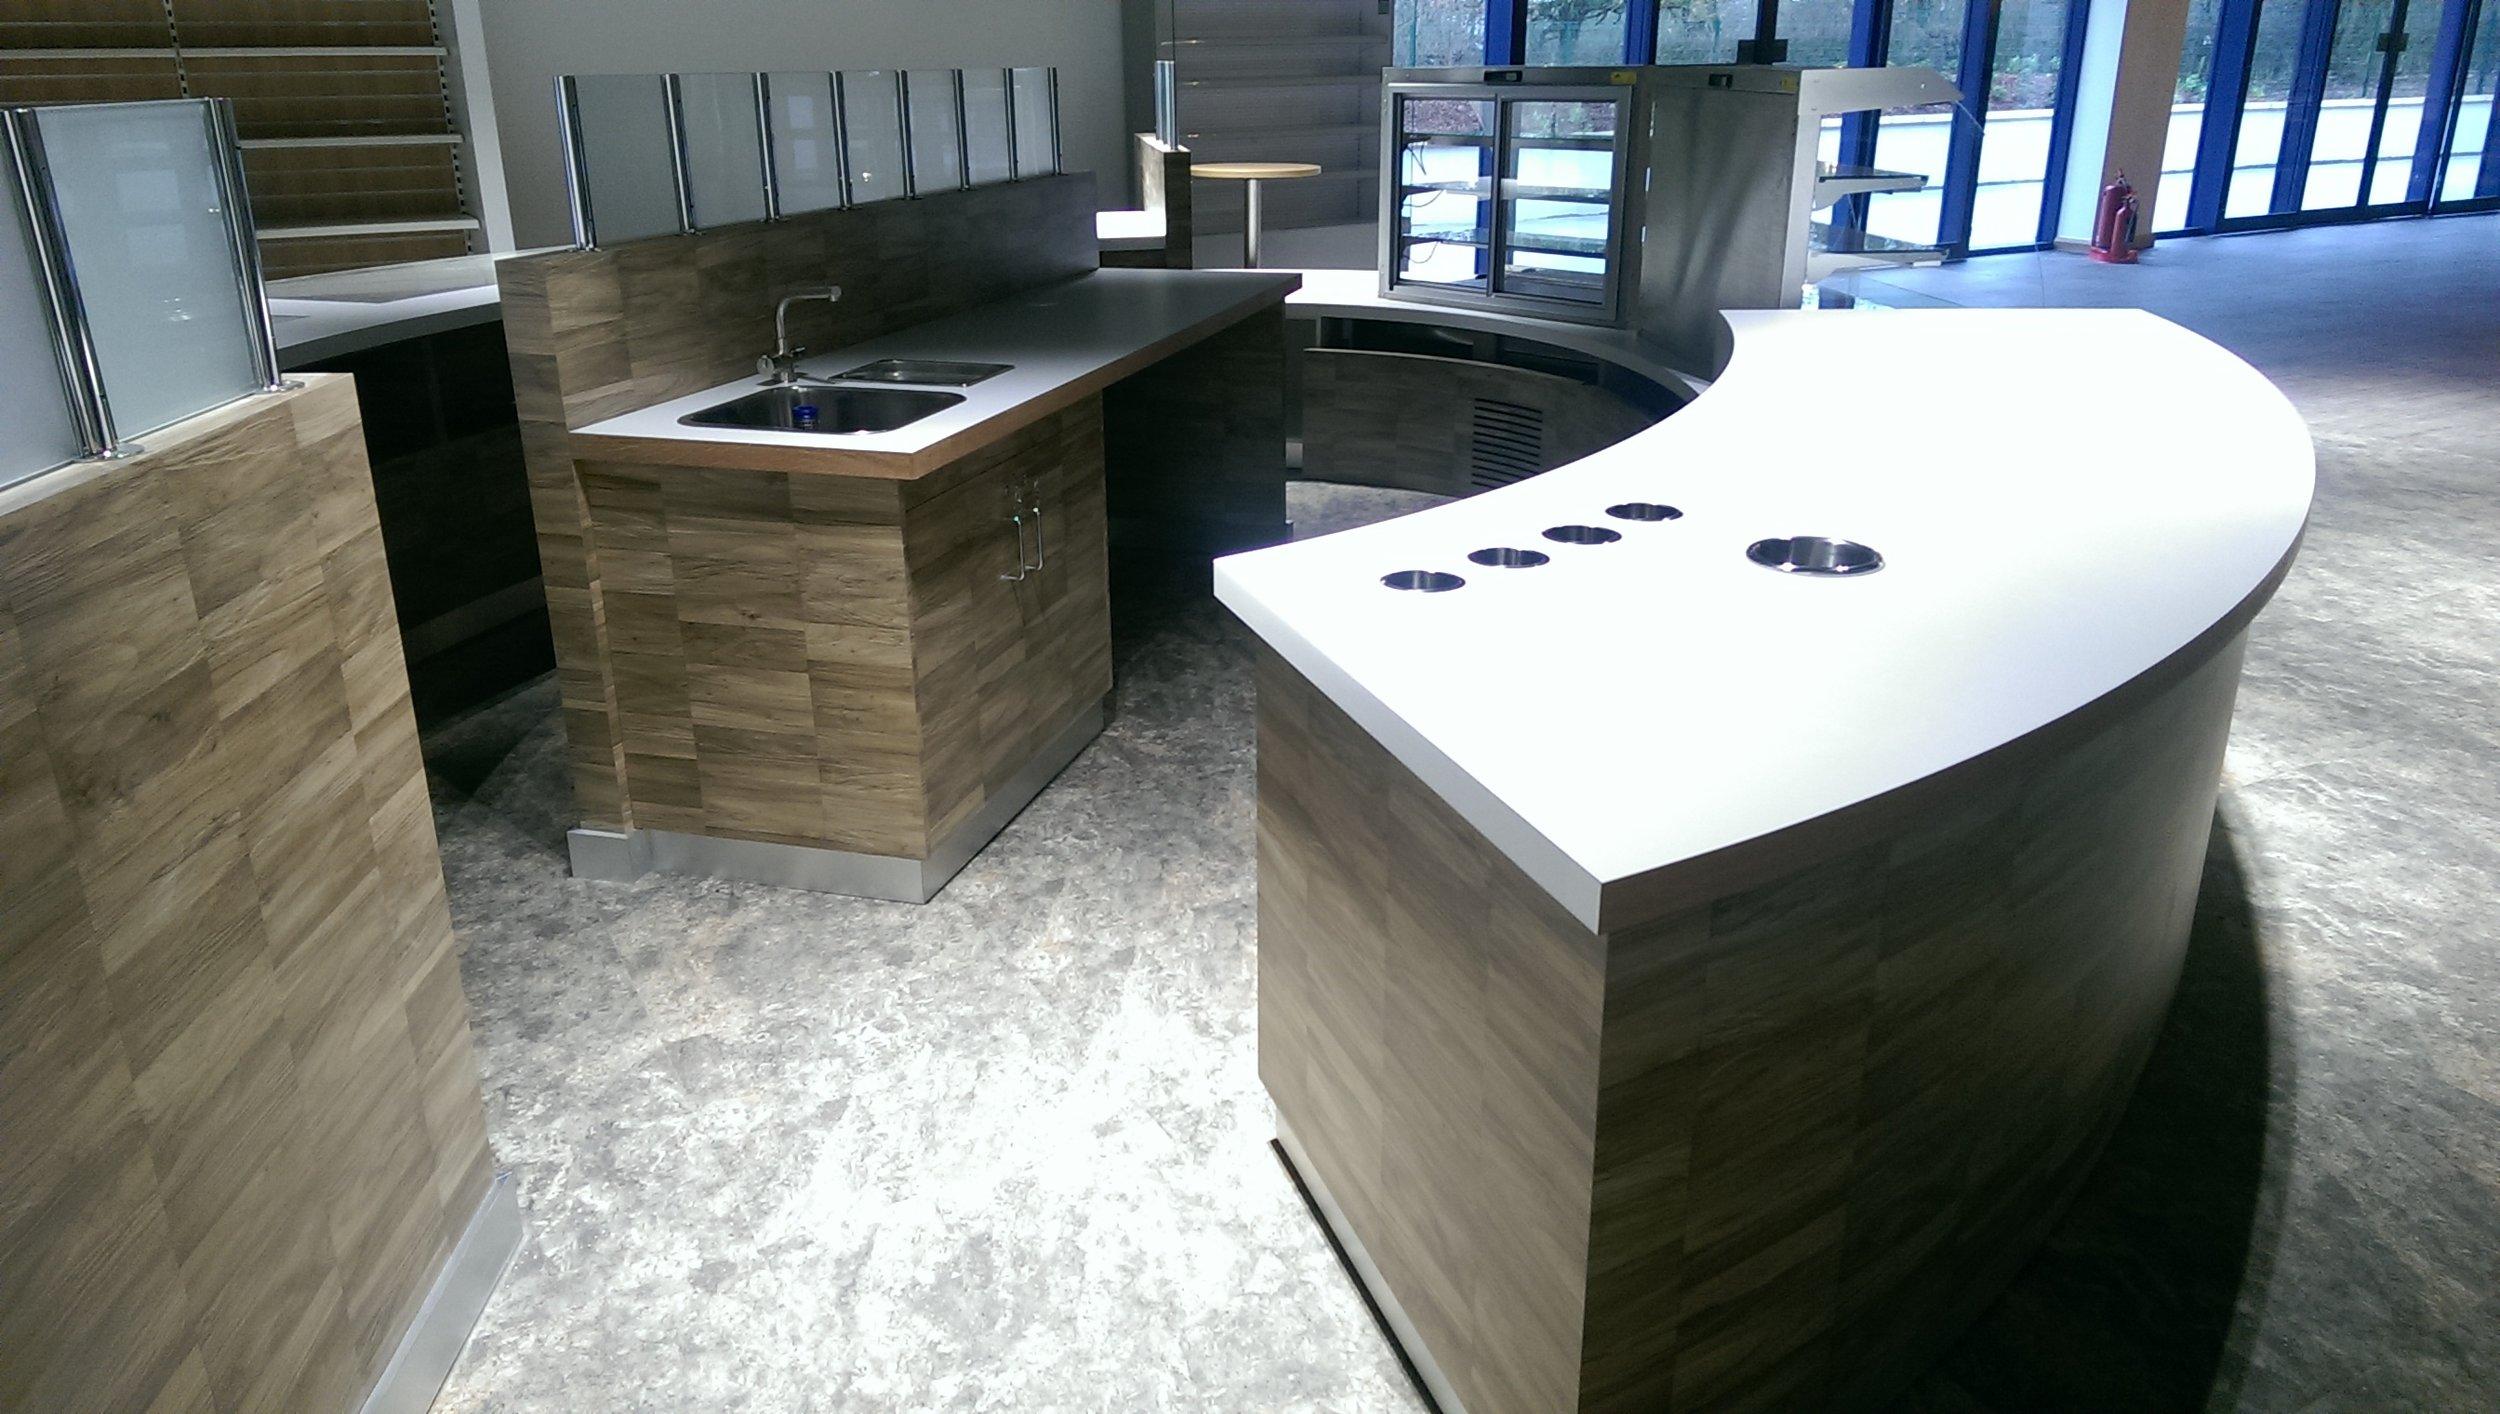 Hillbrush cafeteria servery visitor centre 2